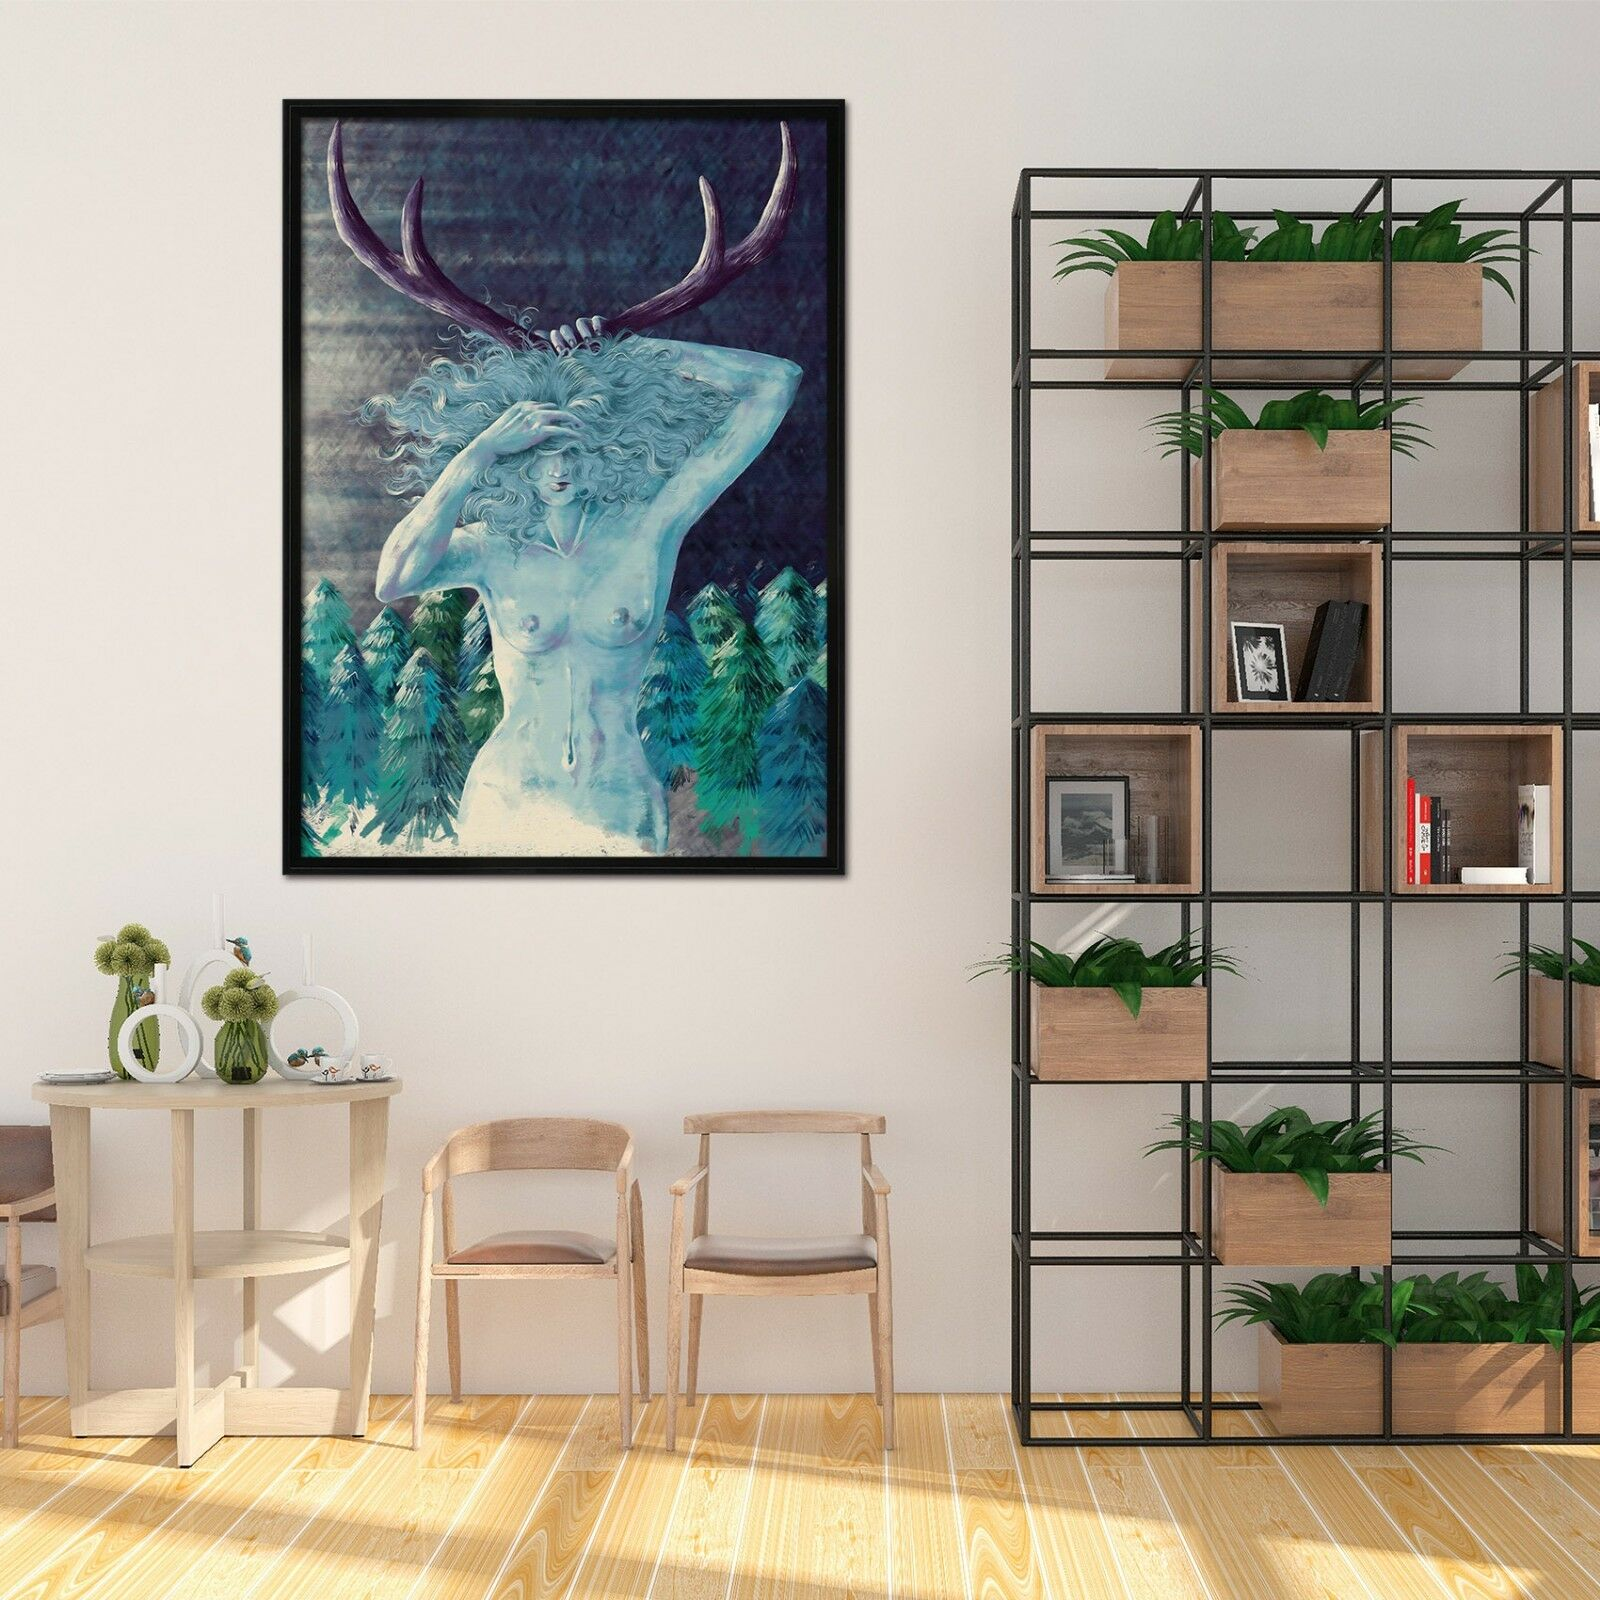 3D Forest Bruja película 2 Póster Enmarcado Decoración del Hogar Pintura de Impresión Arte AJ Wallpaper